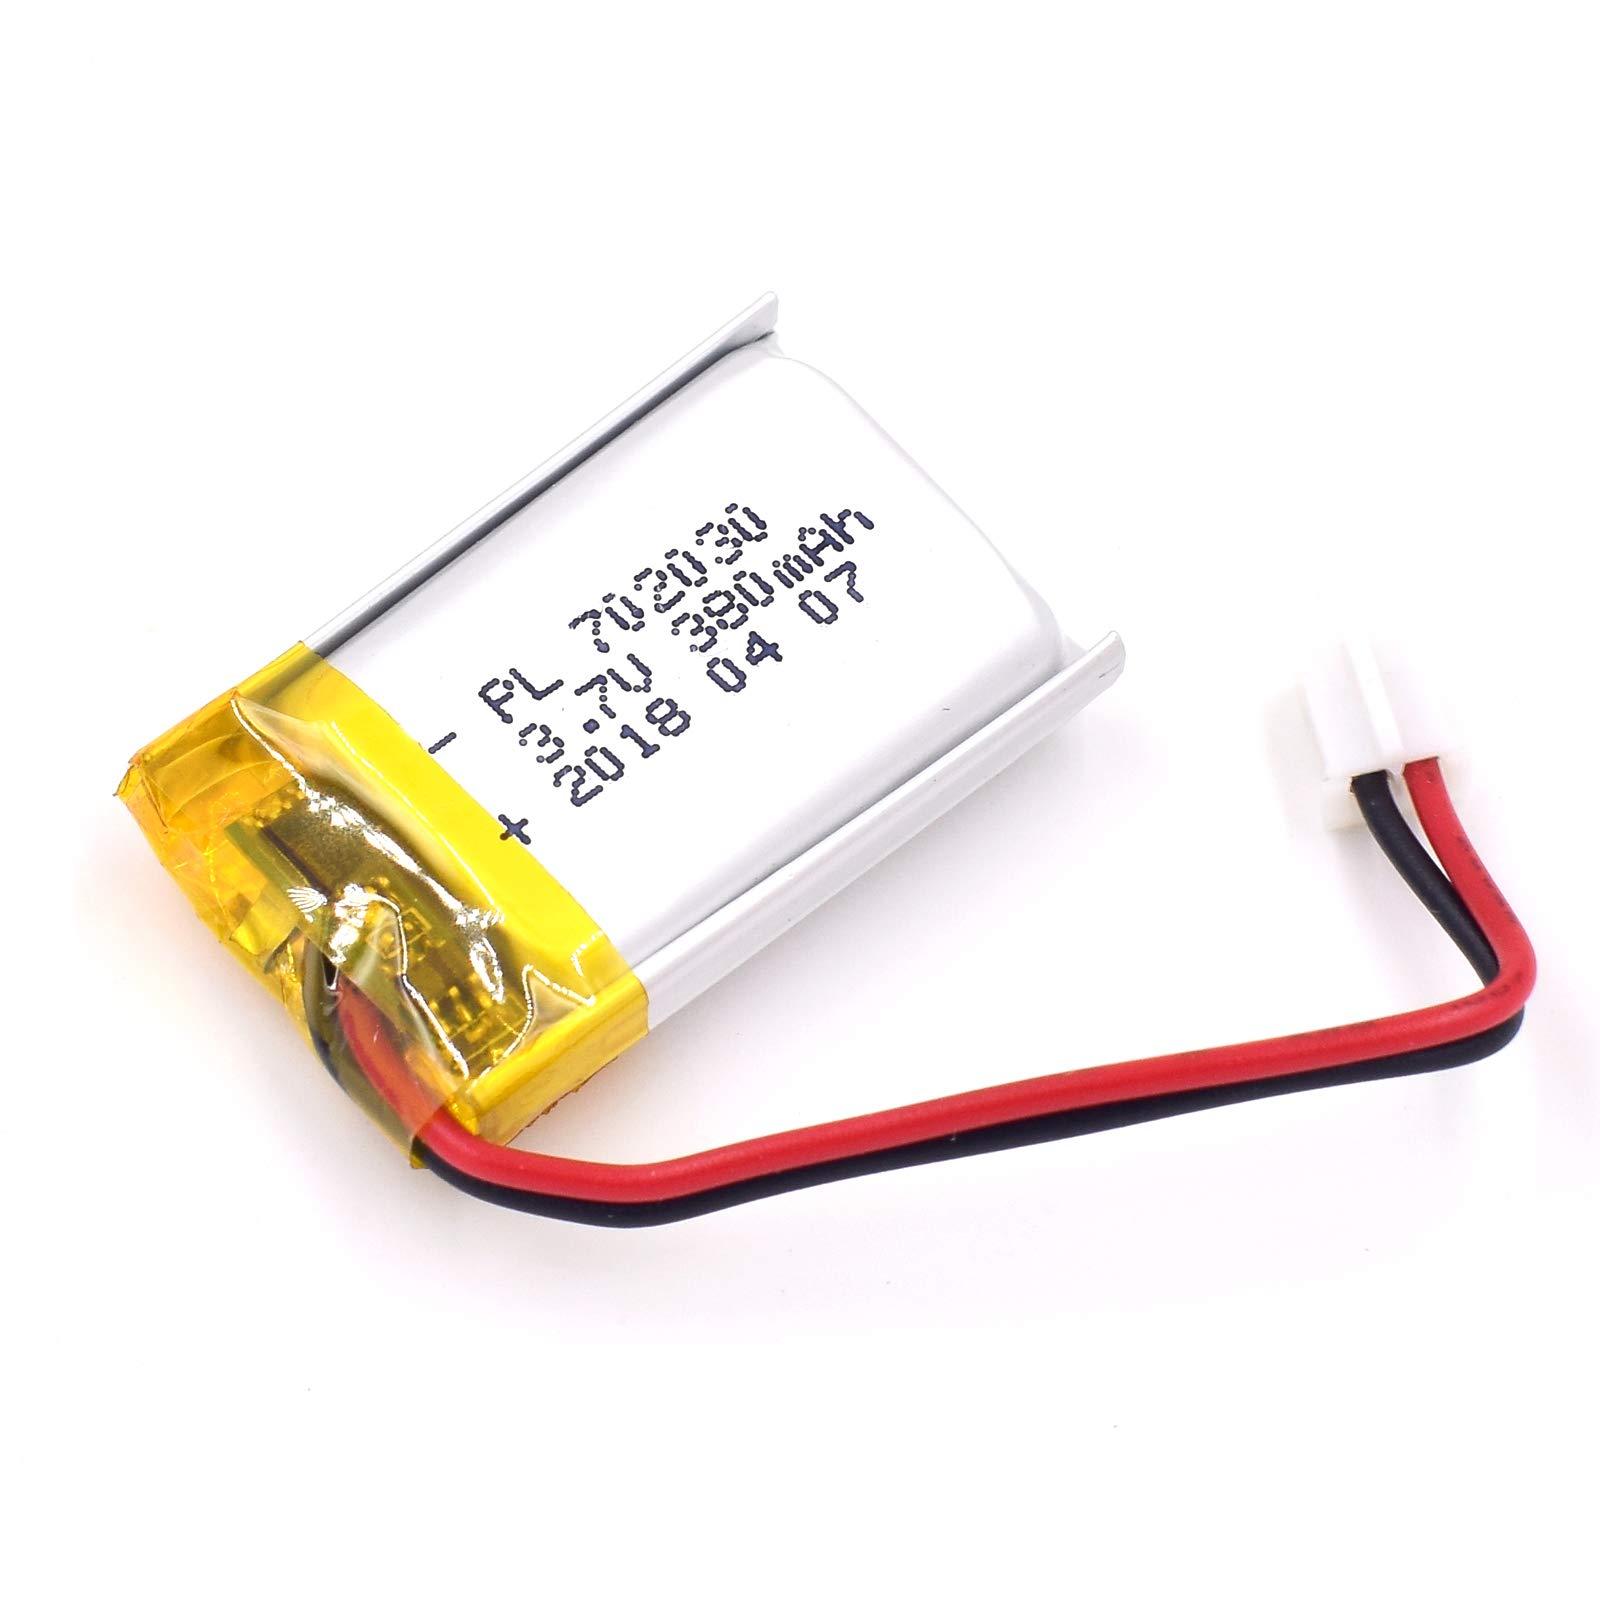 Bateria Lipo 3.7v 380mah 702030